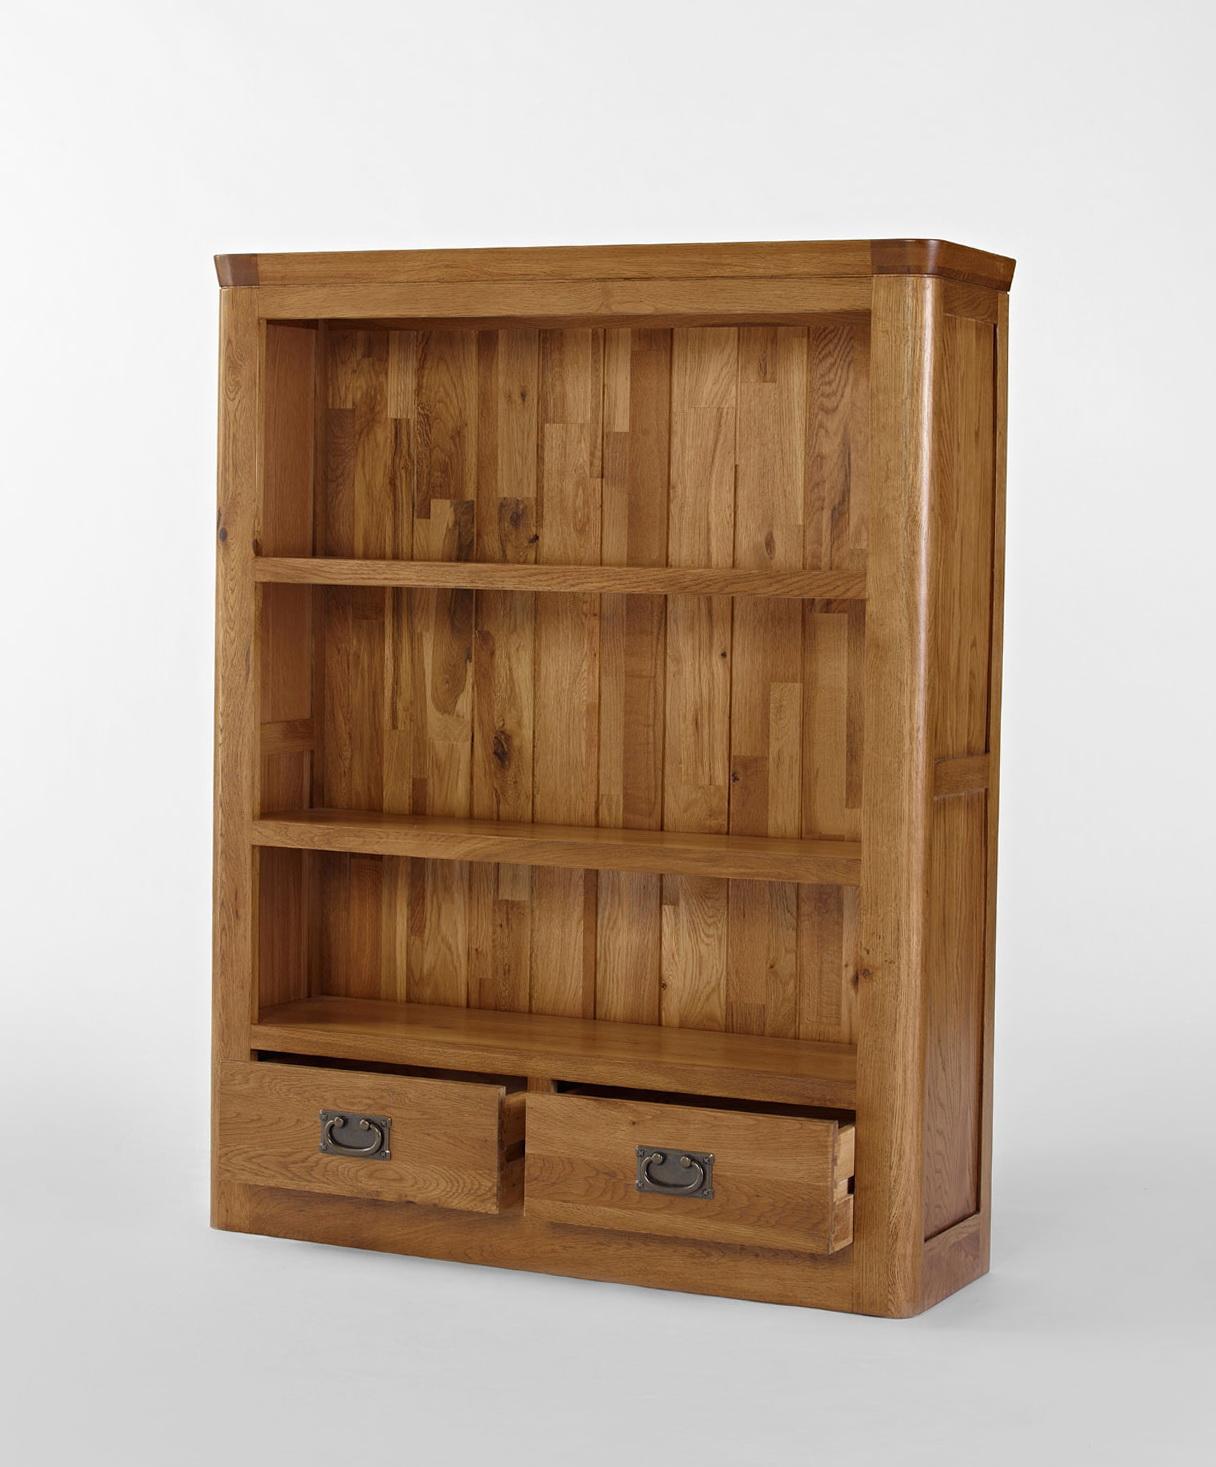 Permalink to Bookshelf With Drawers On Bottom